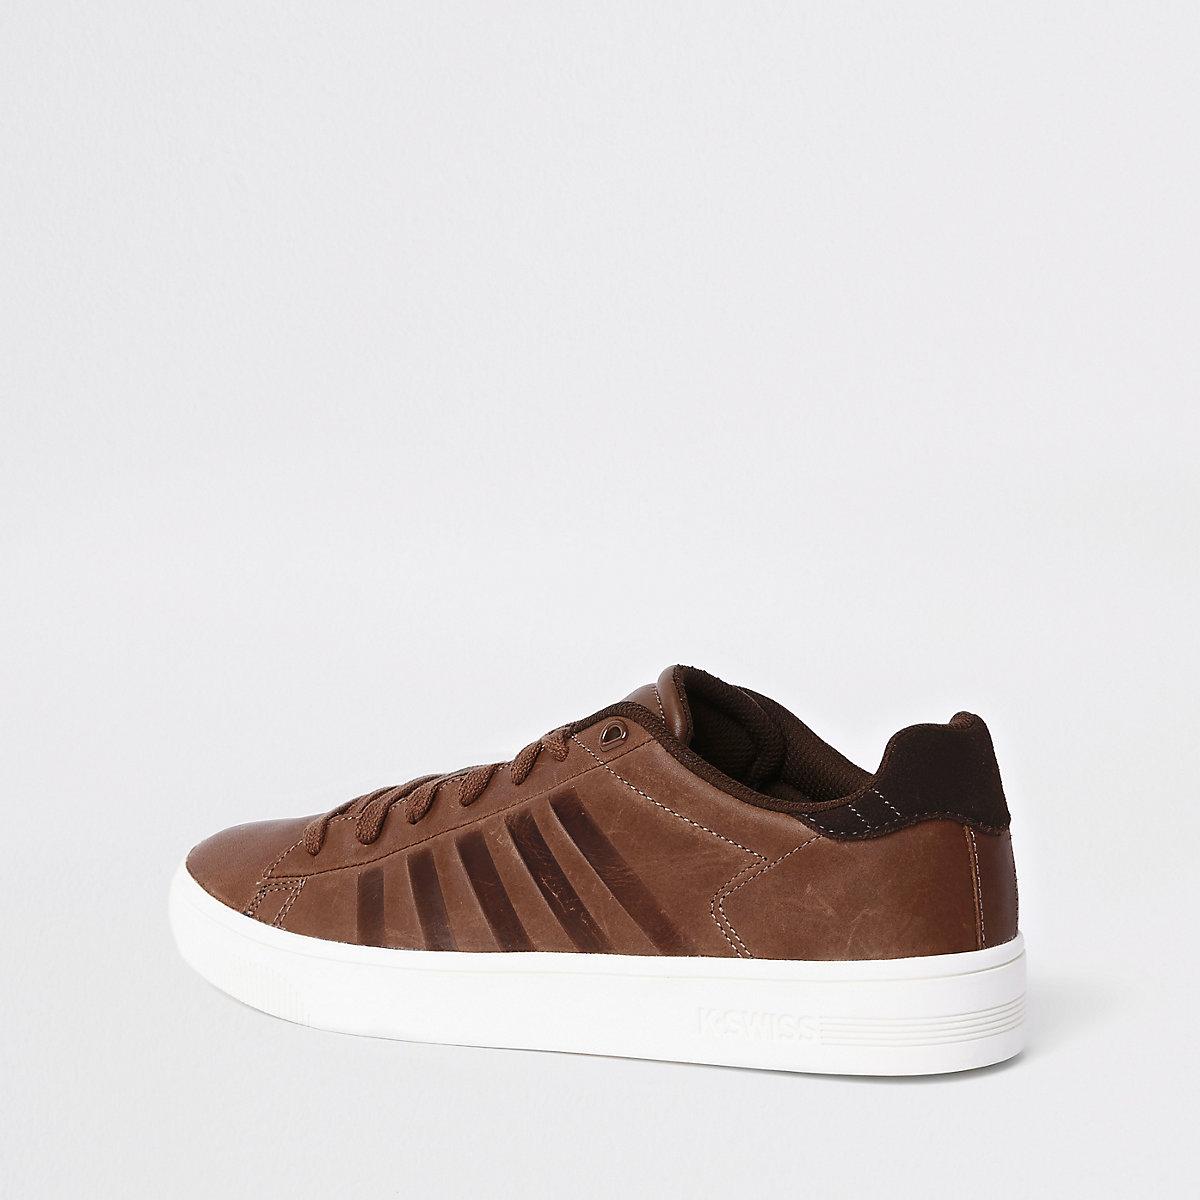 dfc17b3d5530 K-Swiss – Braune Low-Top-Sneaker mit Cup-Sohle - Schuhe   Stiefel ...